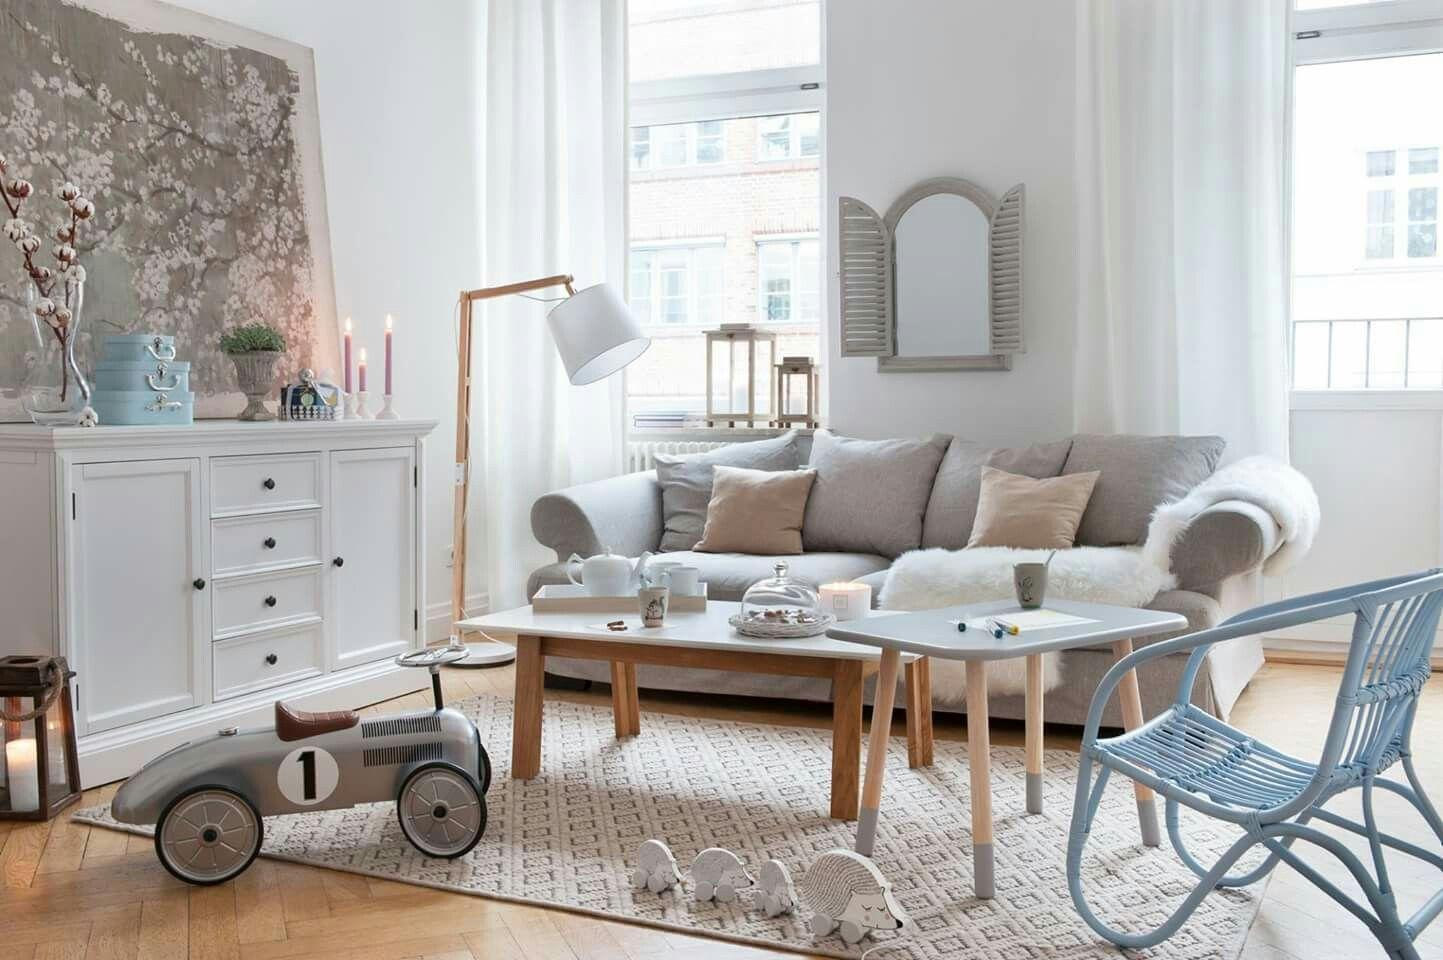 Living Room Decor Ideas With Feminine Touches   Home Decor Ideas